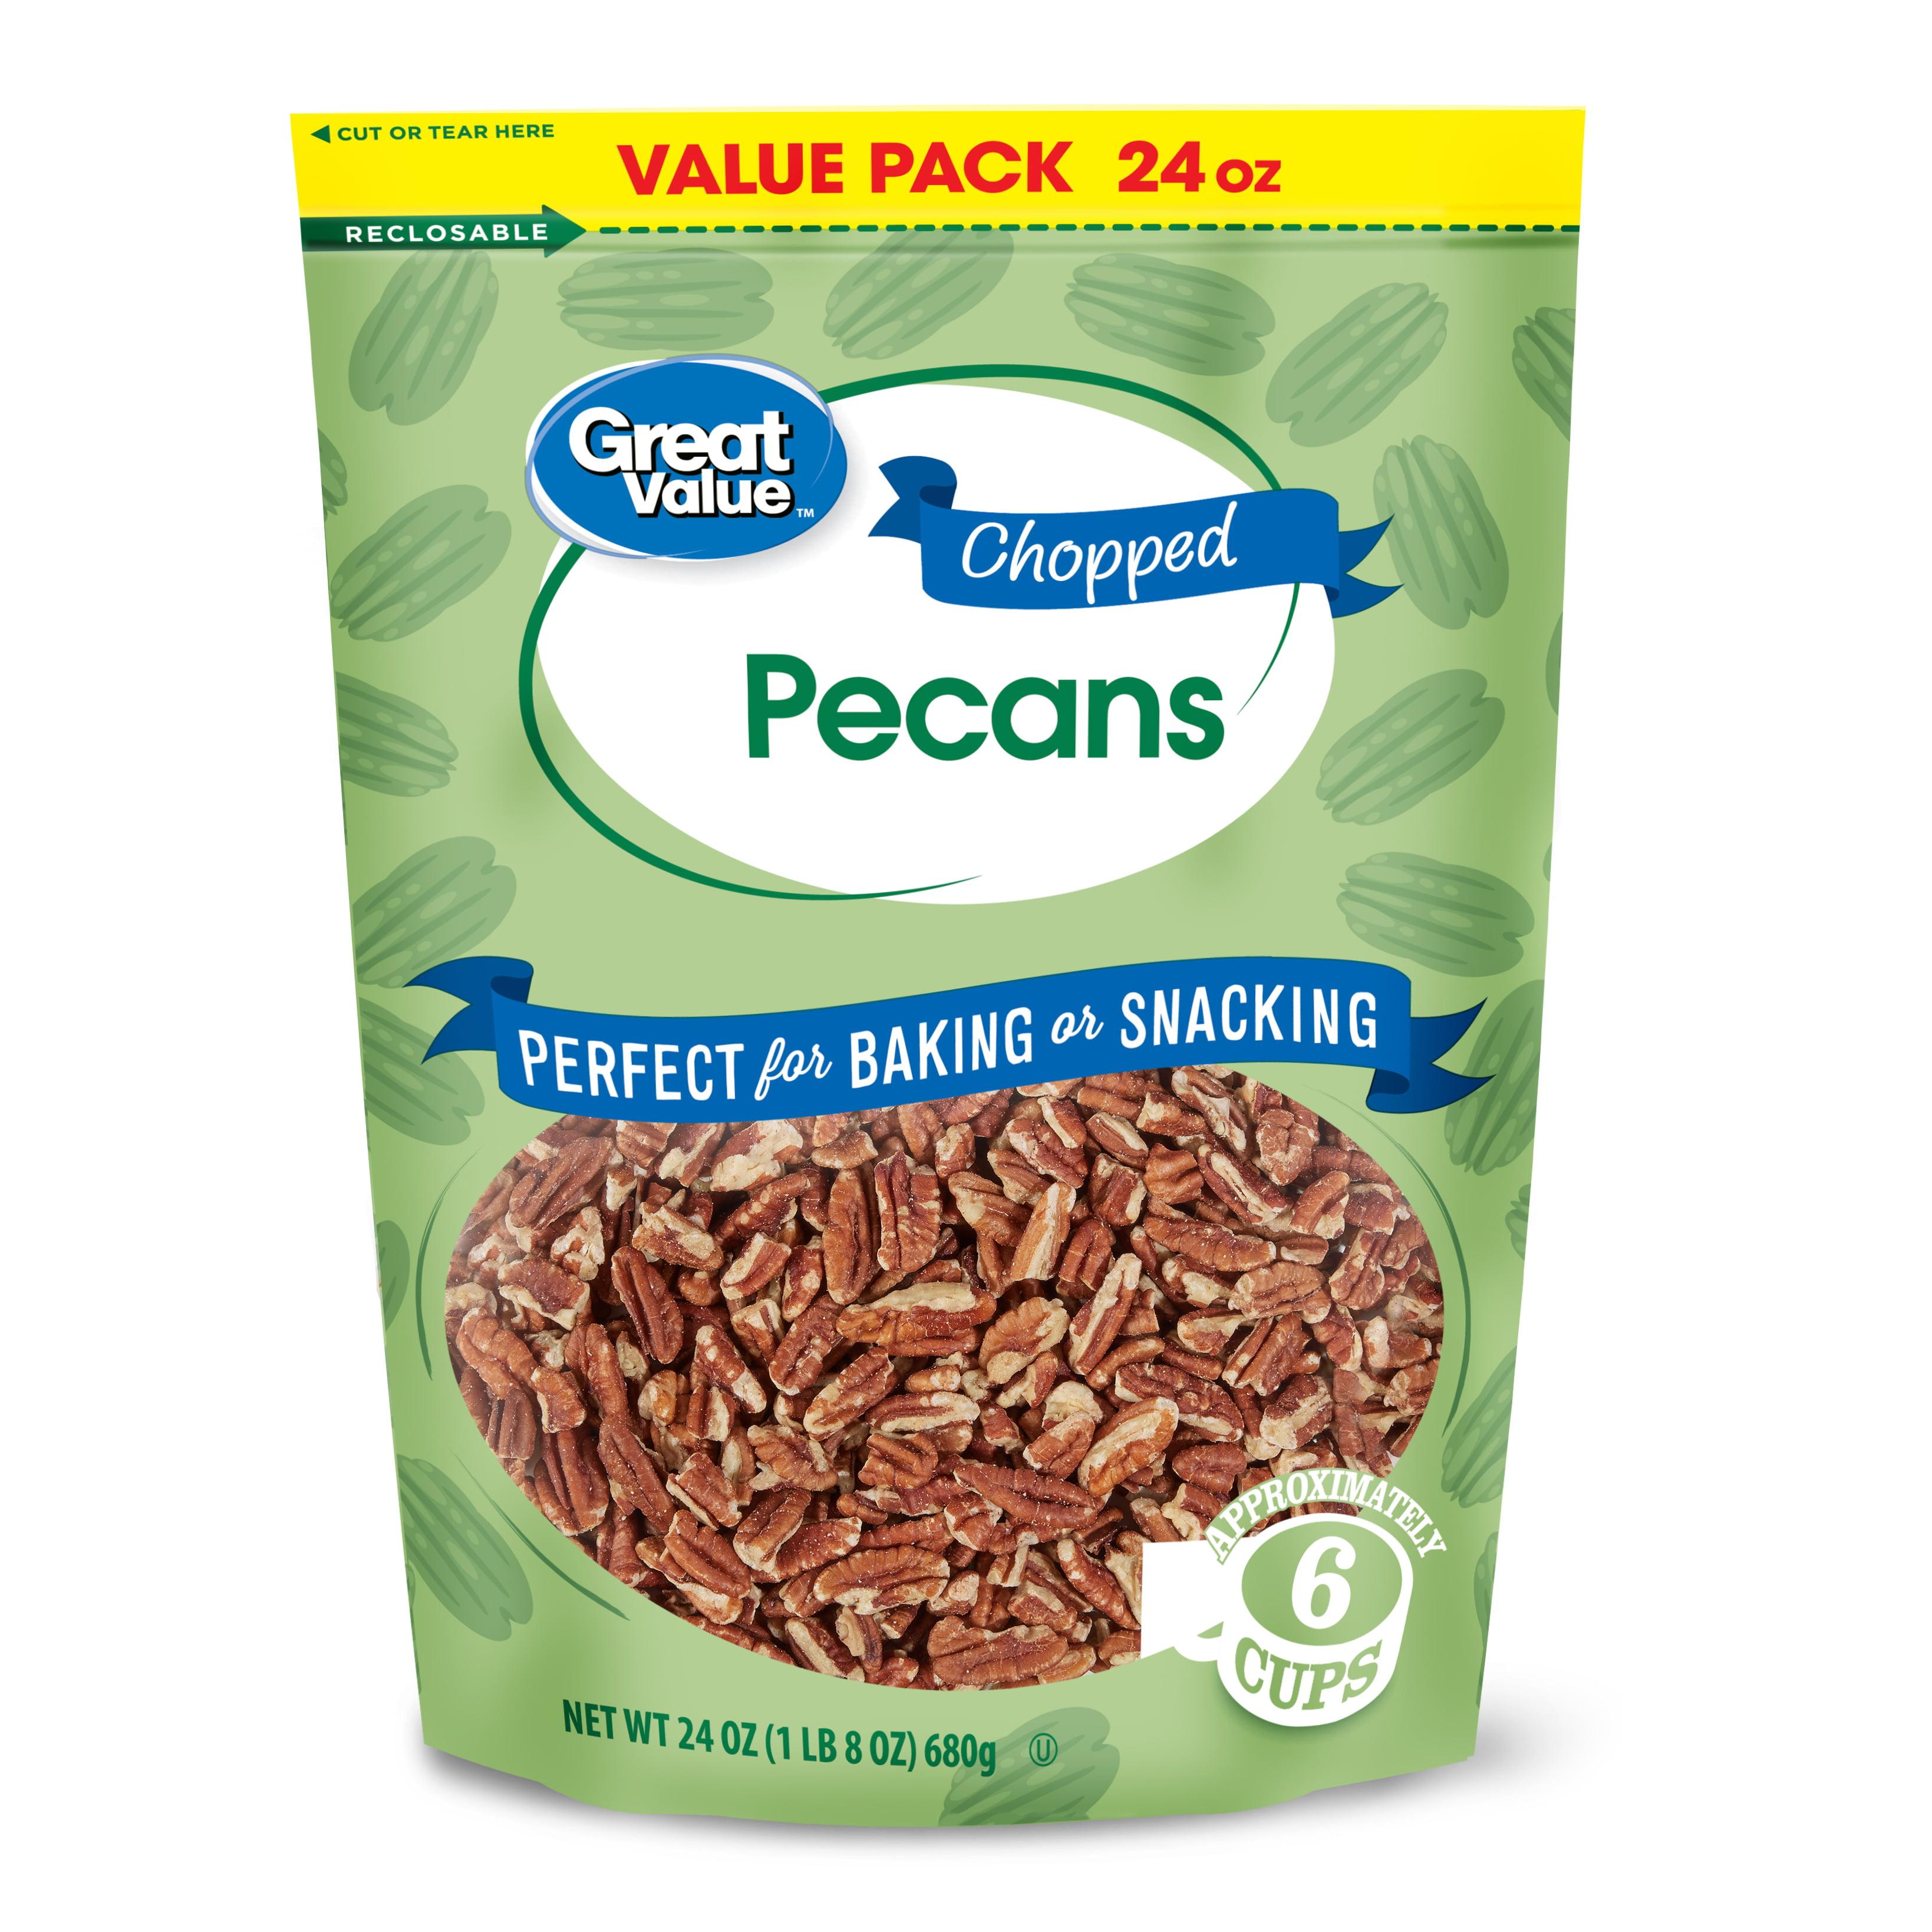 Chopped Pecans, 24 Oz Value Pack